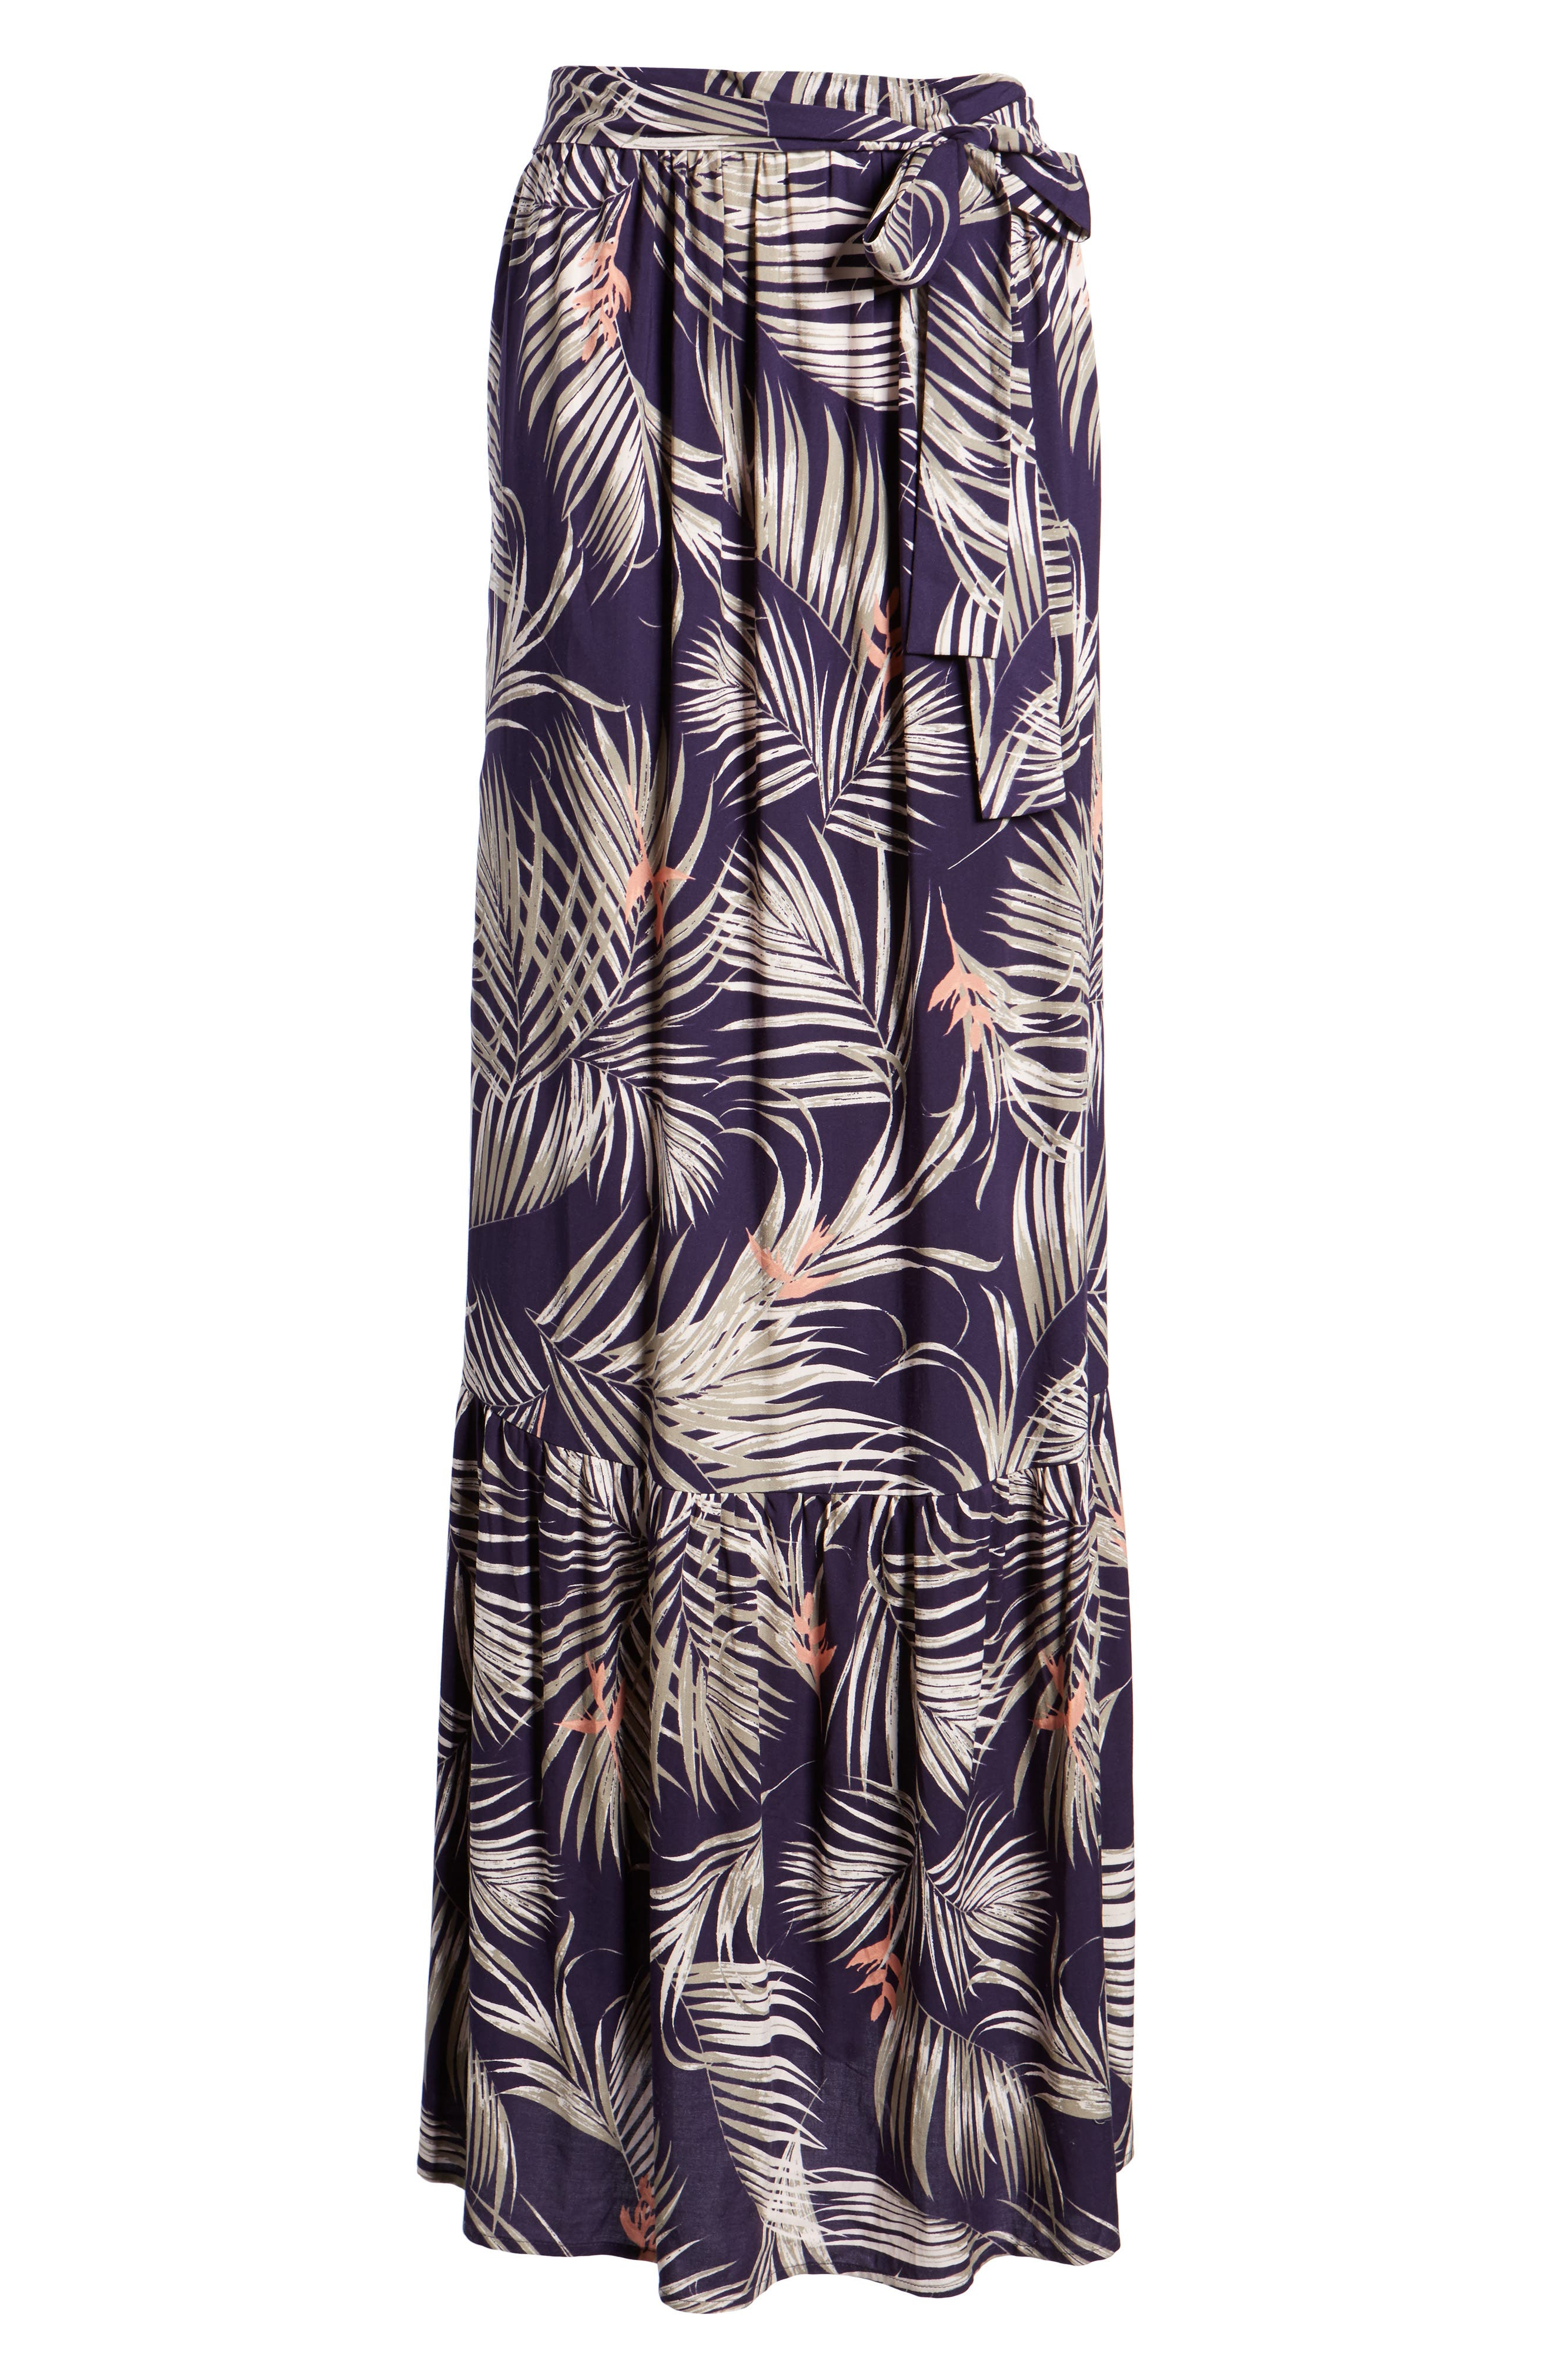 Sunset Cover-Up Maxi Dress,                             Alternate thumbnail 6, color,                             Latona Palm Evening Blue